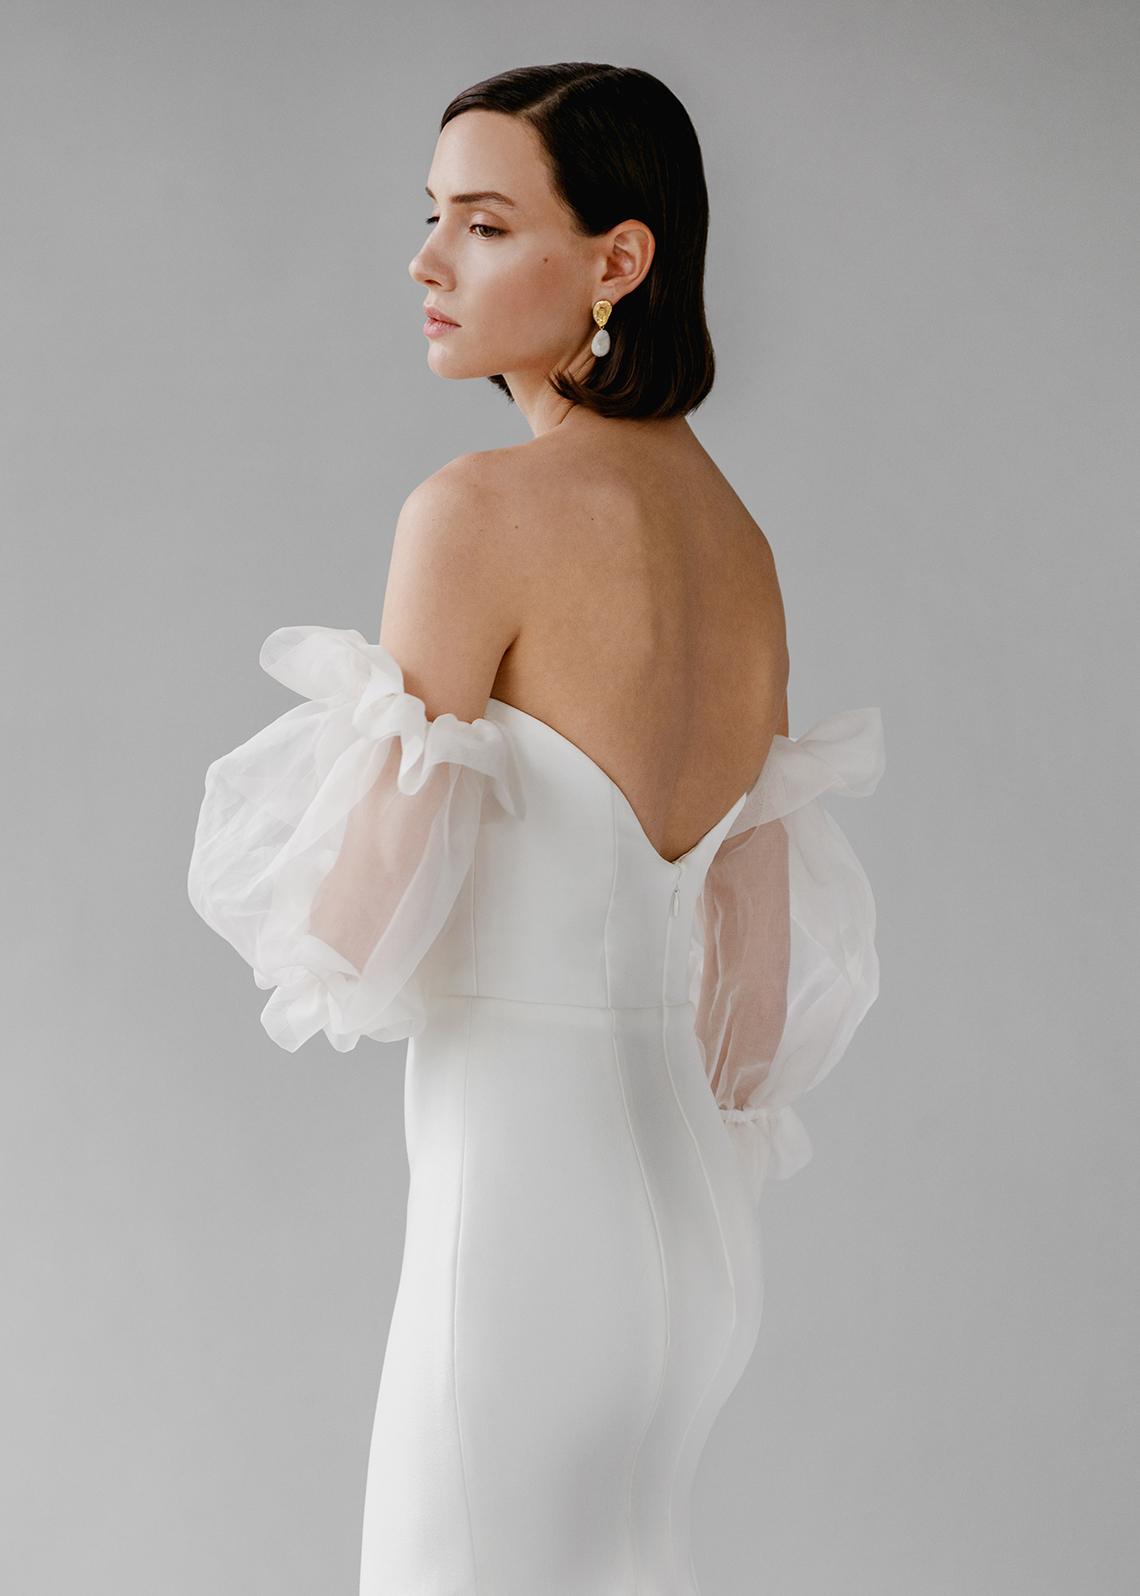 Modern Minimalist 2021 Wedding Dresses by Aesling Bride – Panacea Dress 5